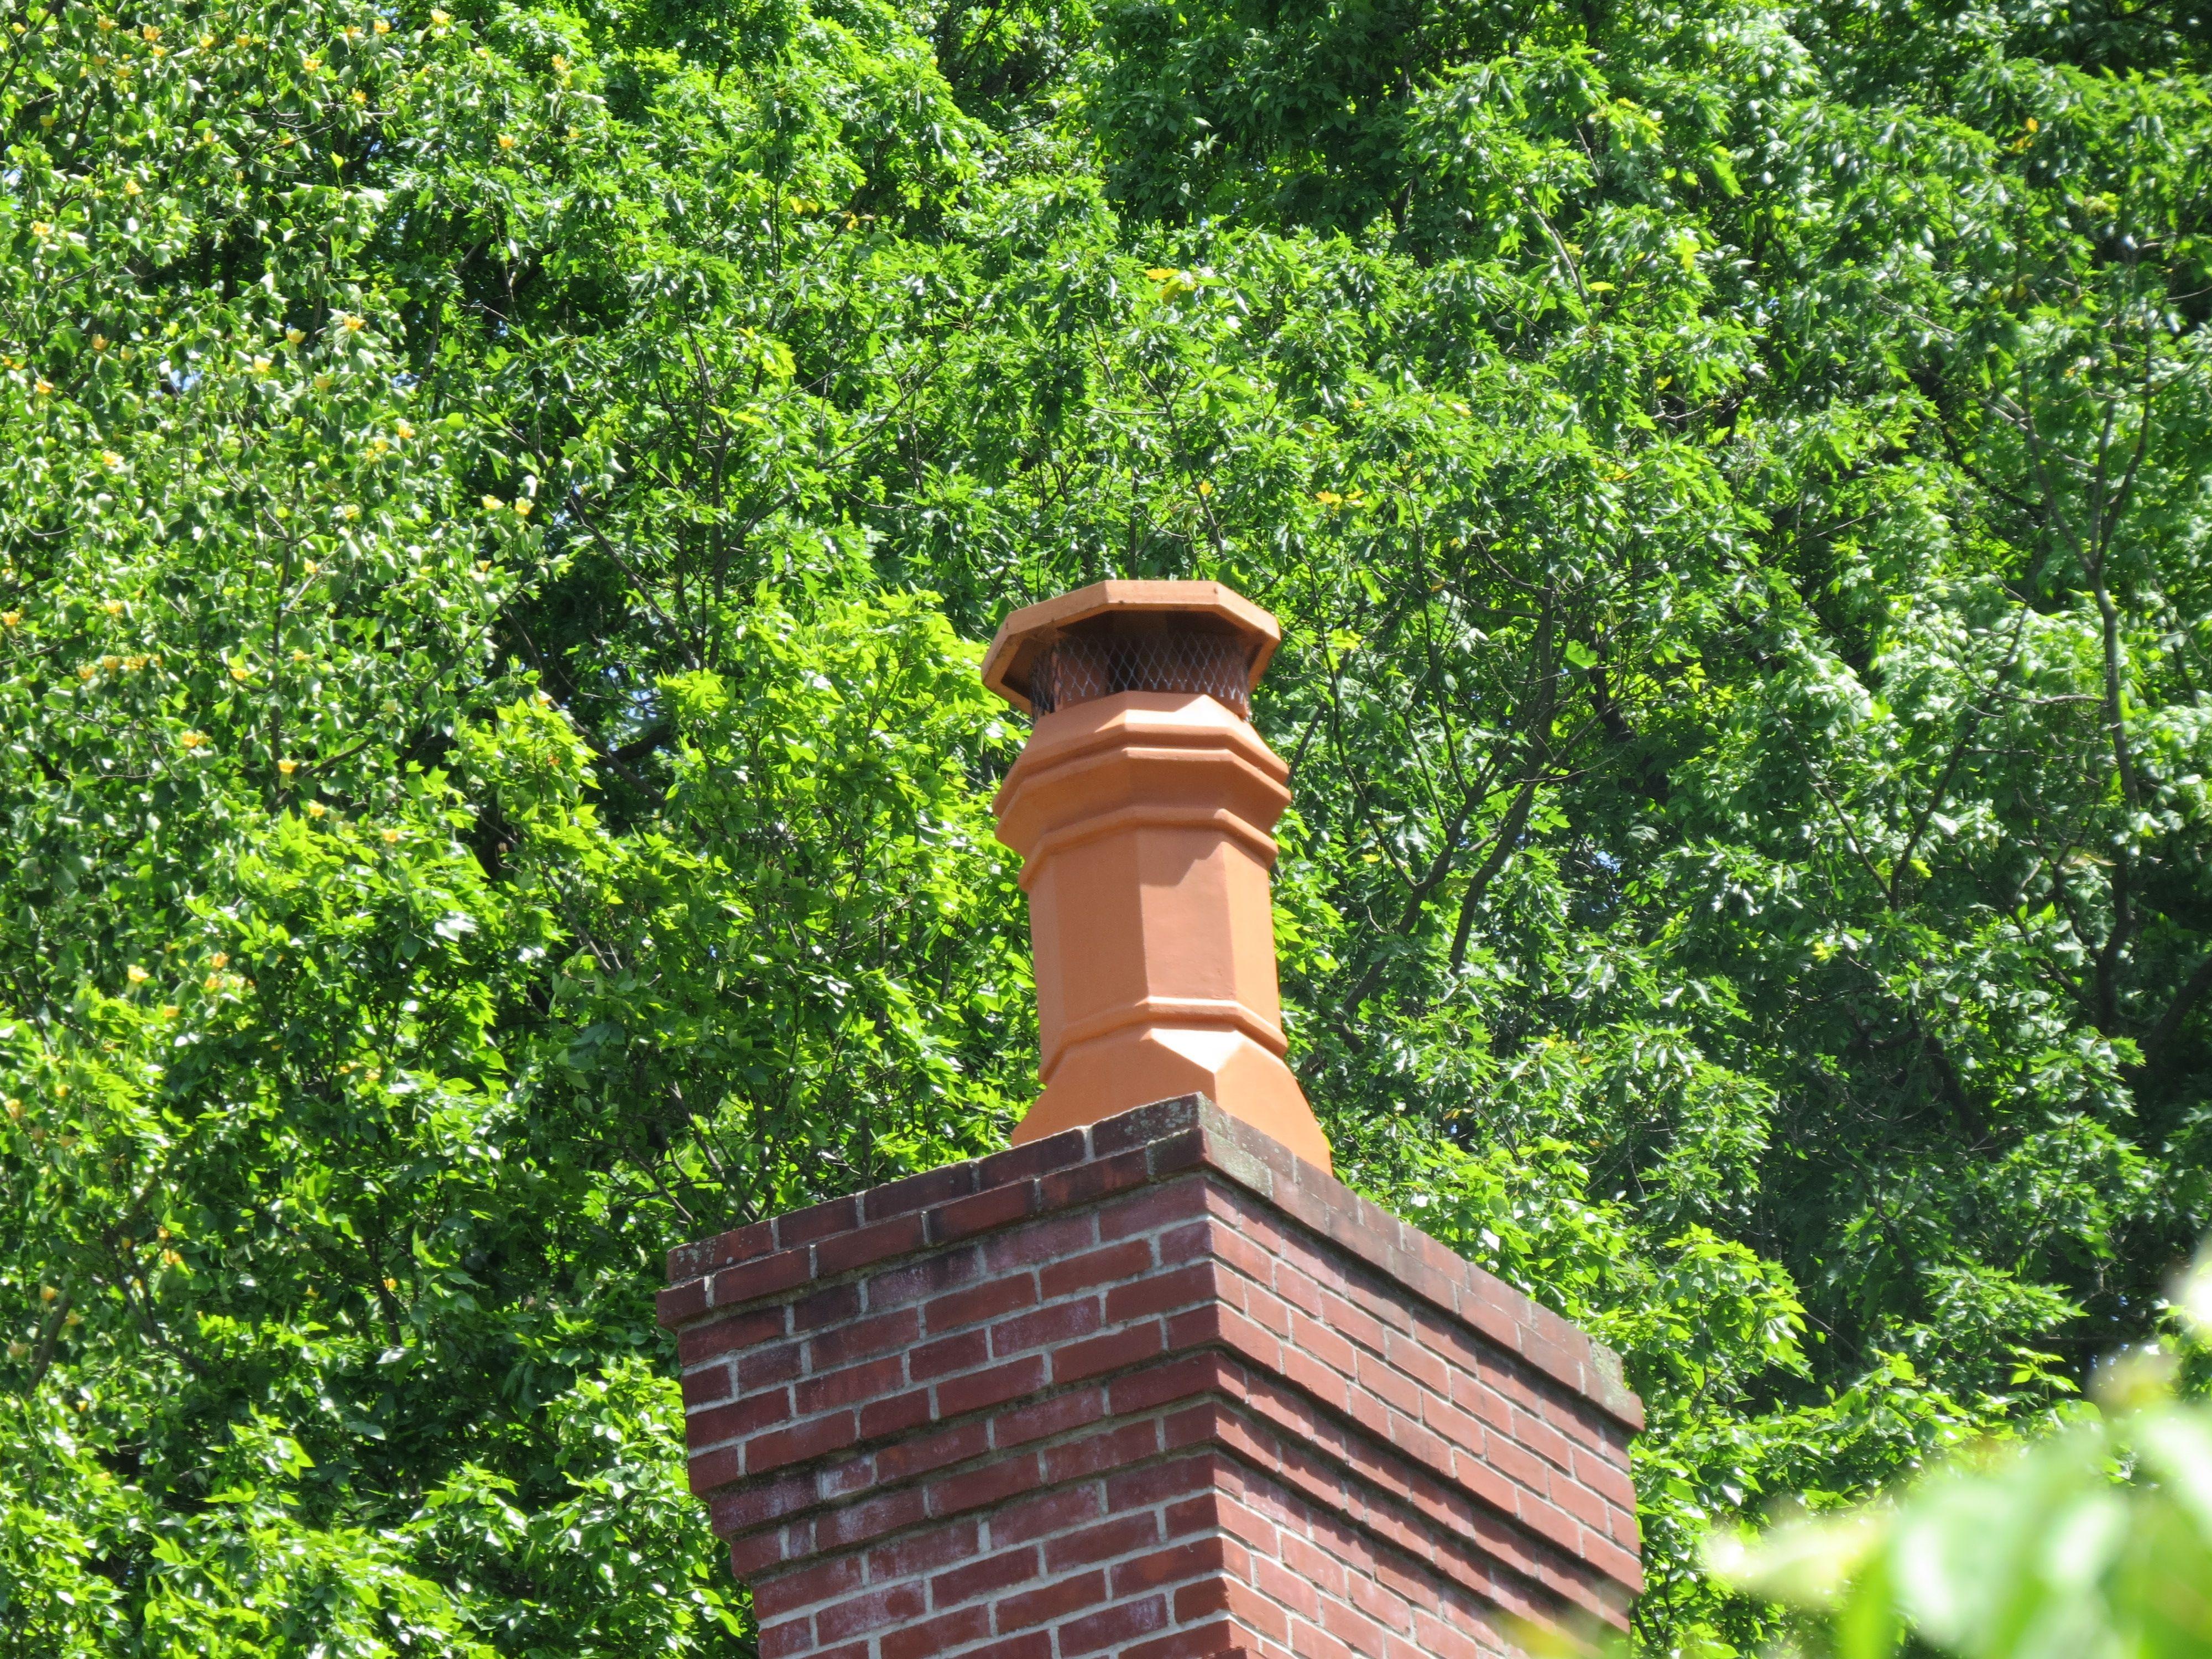 Rain Guard On Chimney Pot Adds Extra Protection Chimney Cap Terracotta Pot Image